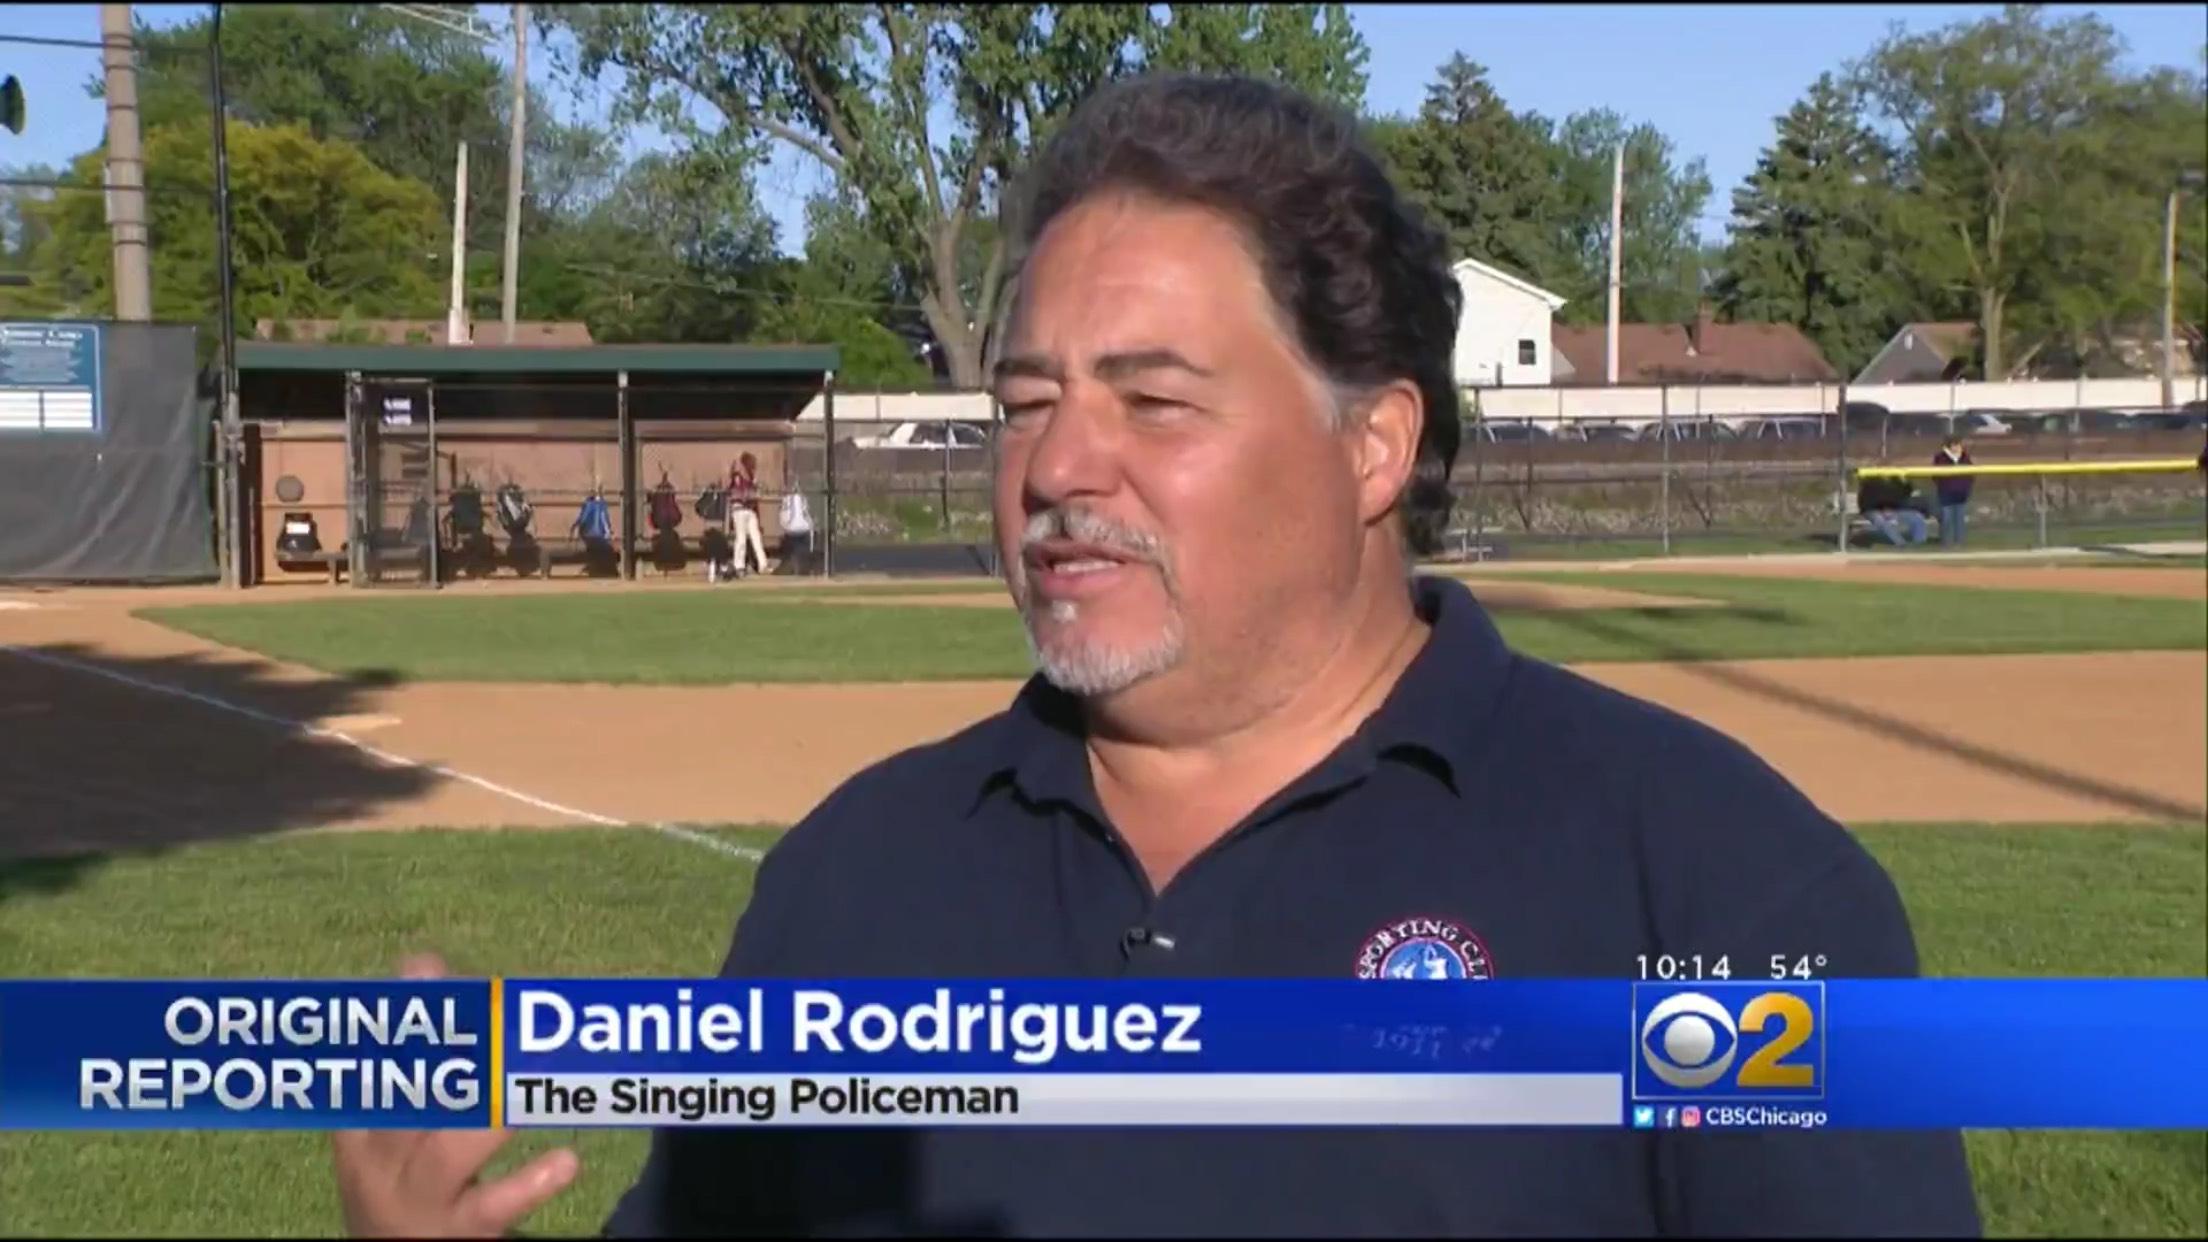 Daniel Rodriguez: The Singing Policeman